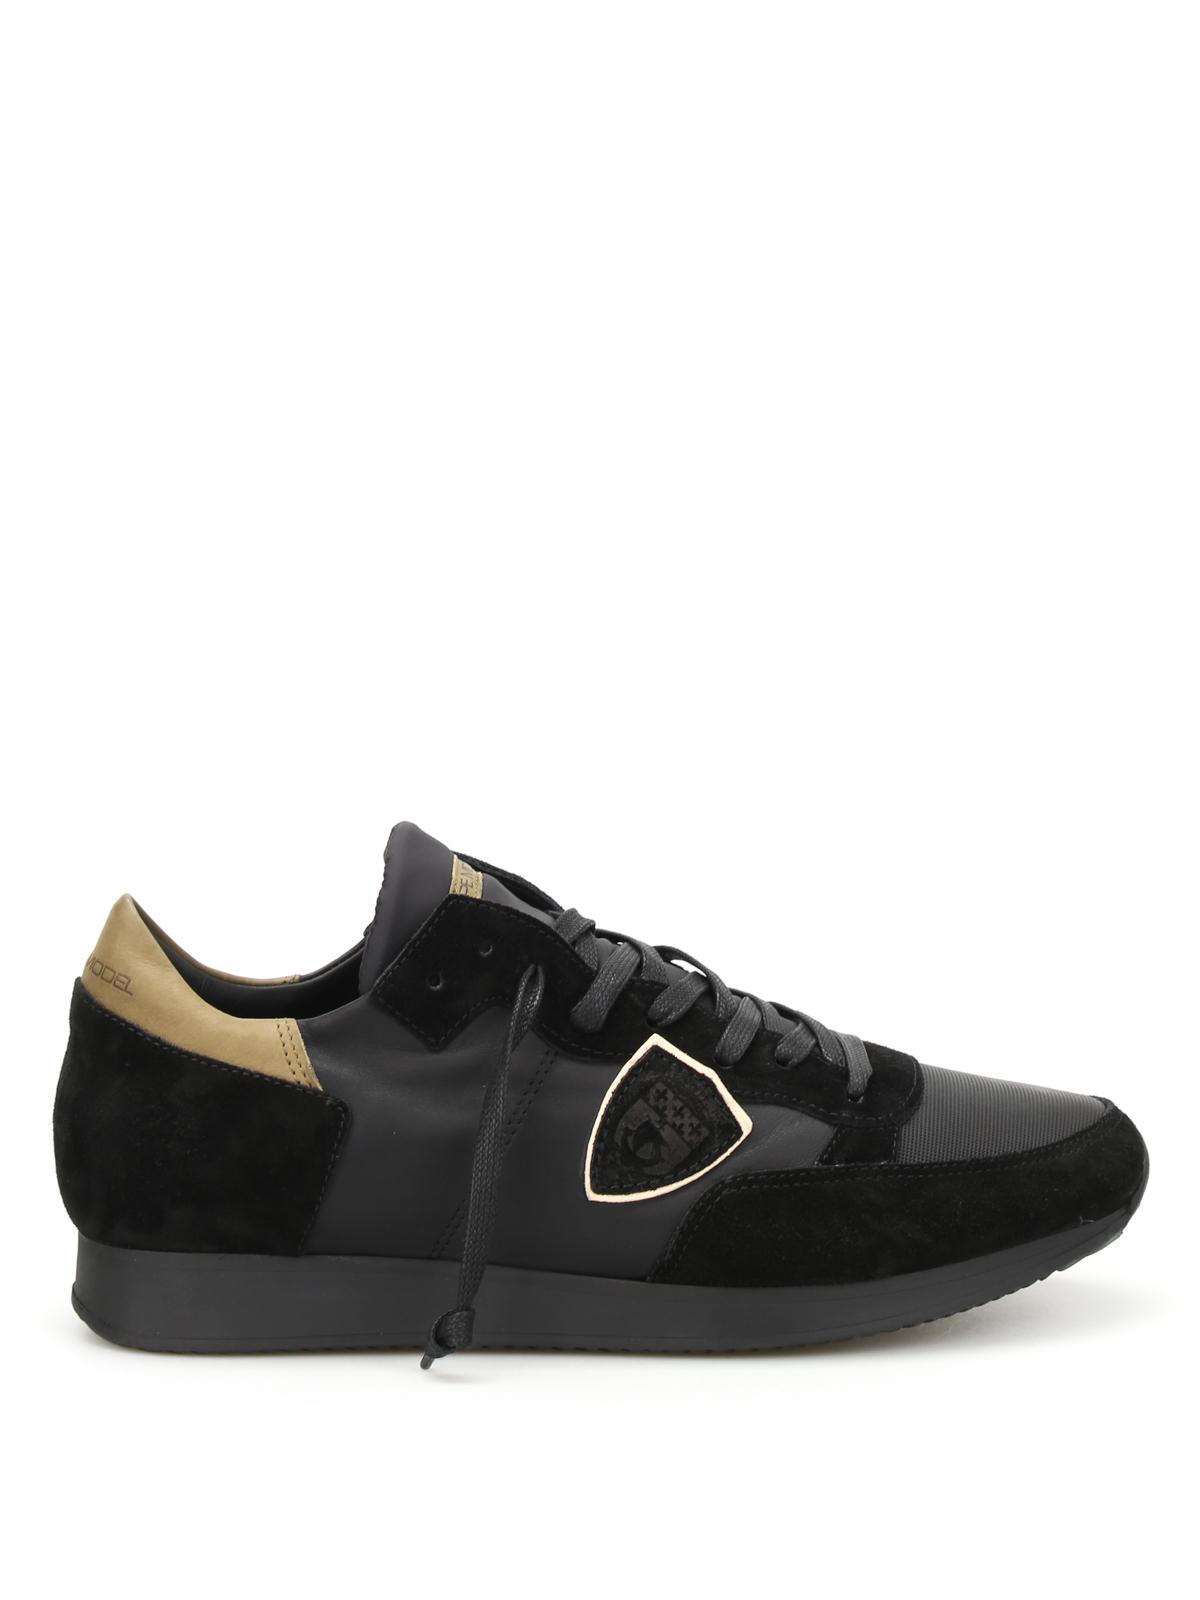 sneaker tropez philippe model sneakers ikrix. Black Bedroom Furniture Sets. Home Design Ideas